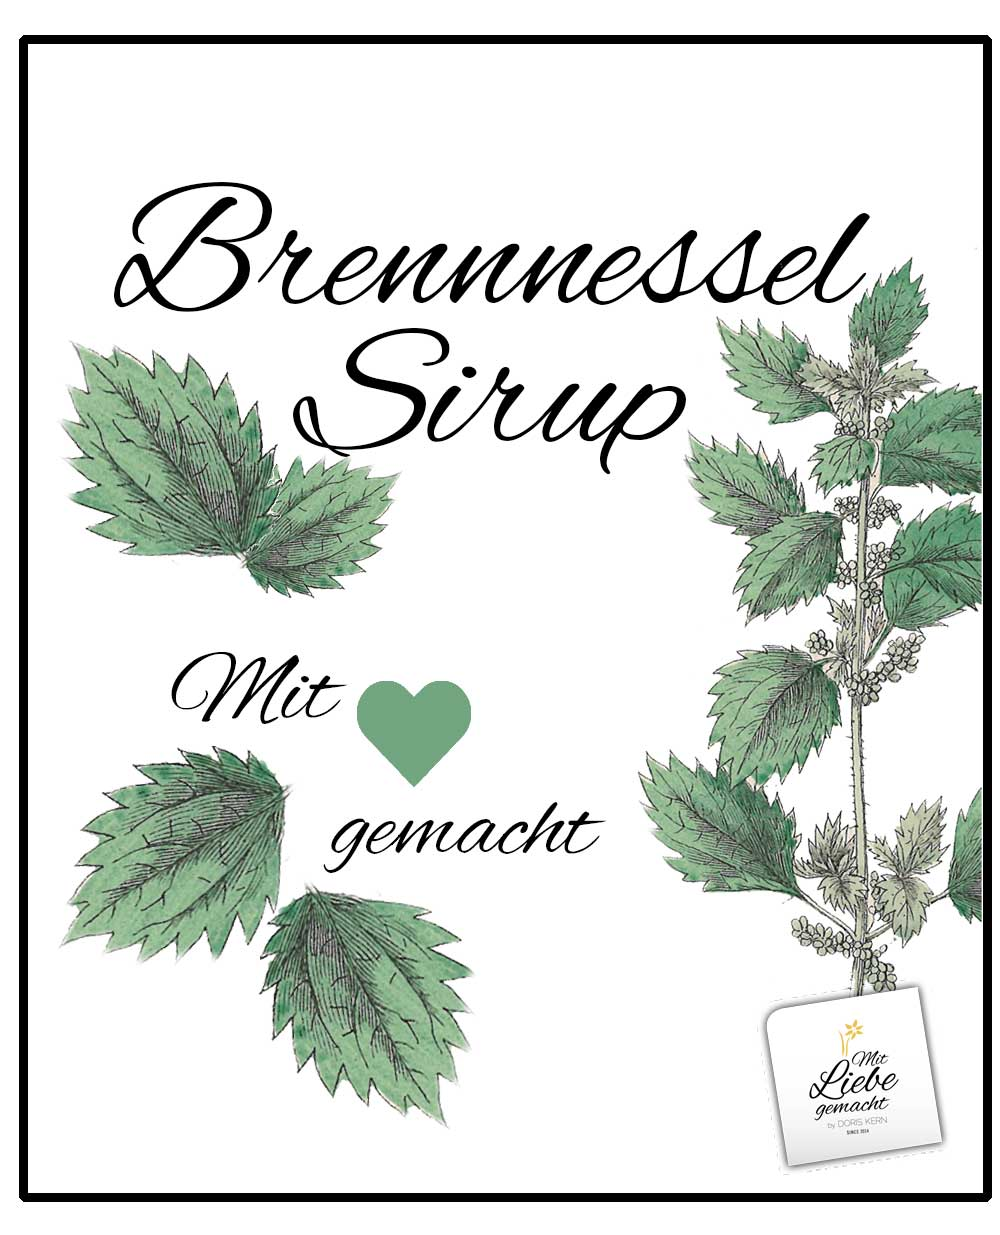 Brennnessel-Sirup